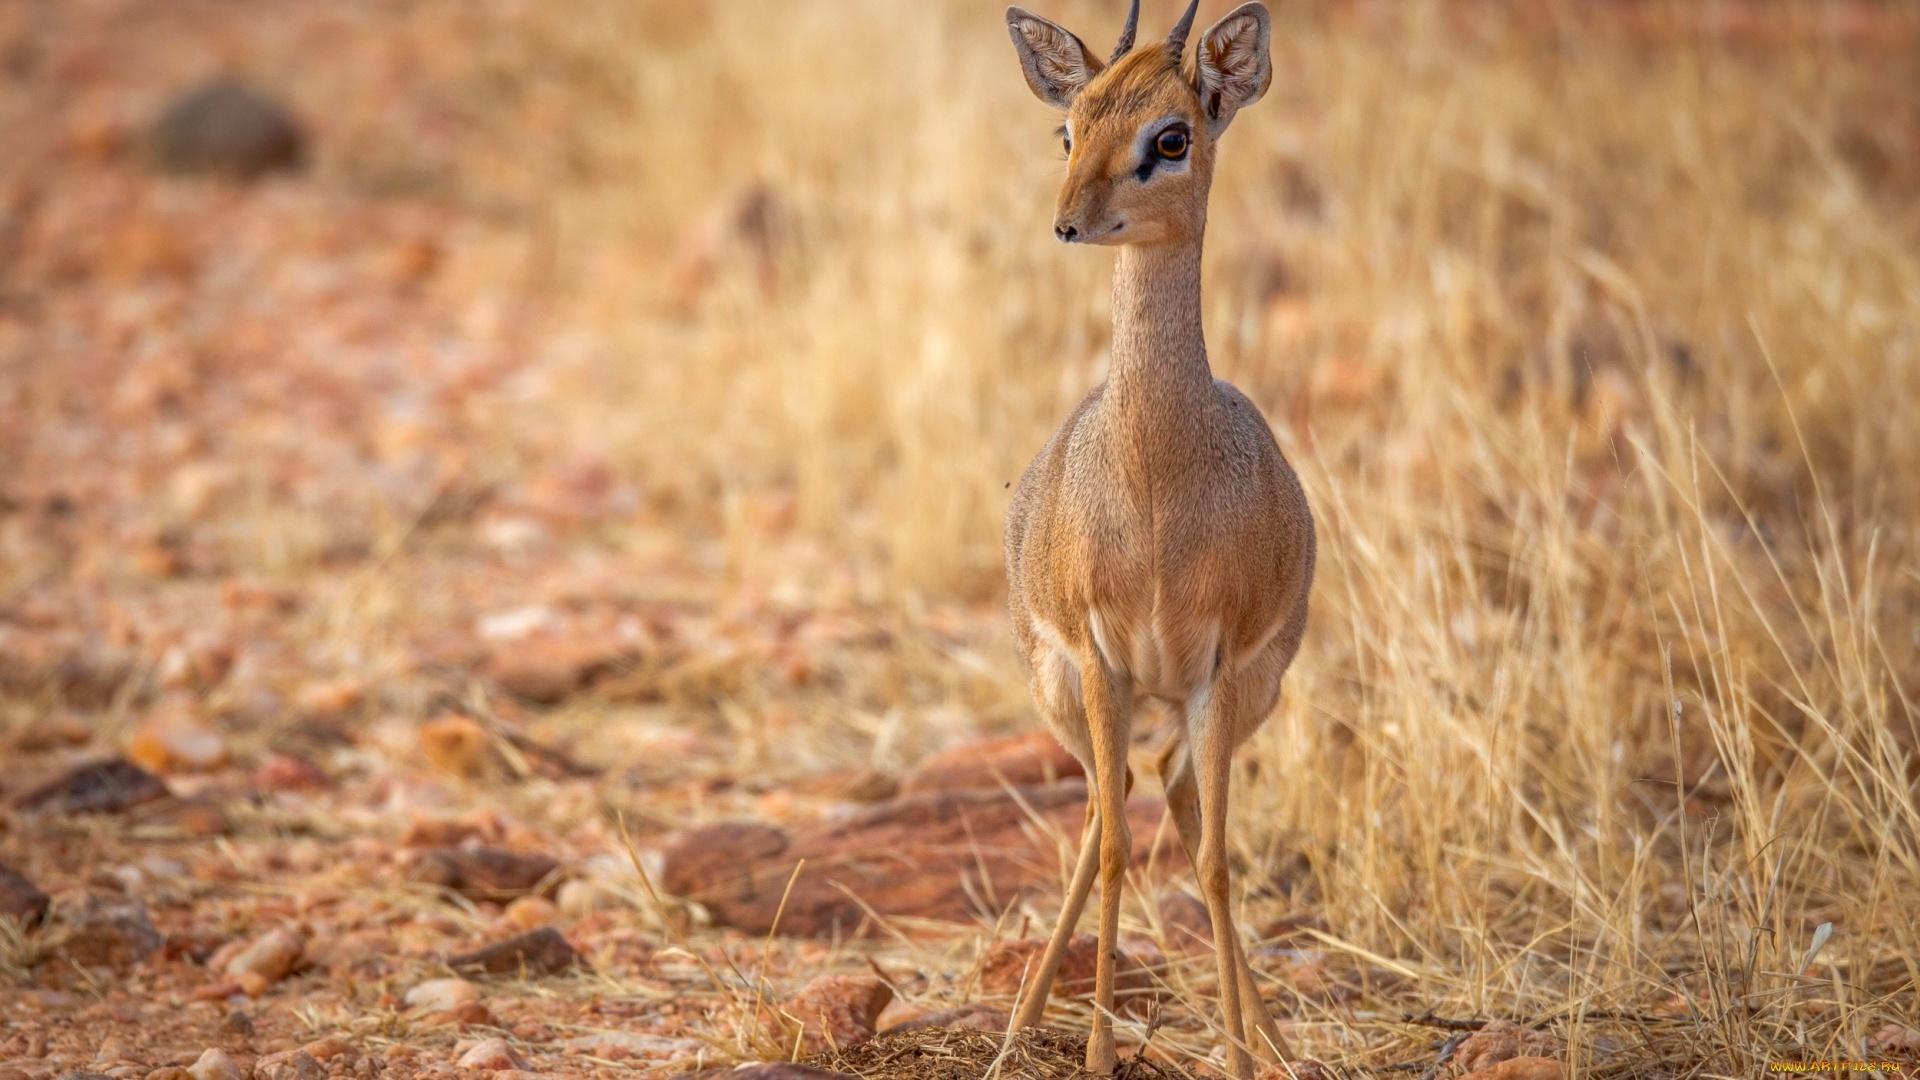 Antelope HD Wallpaper